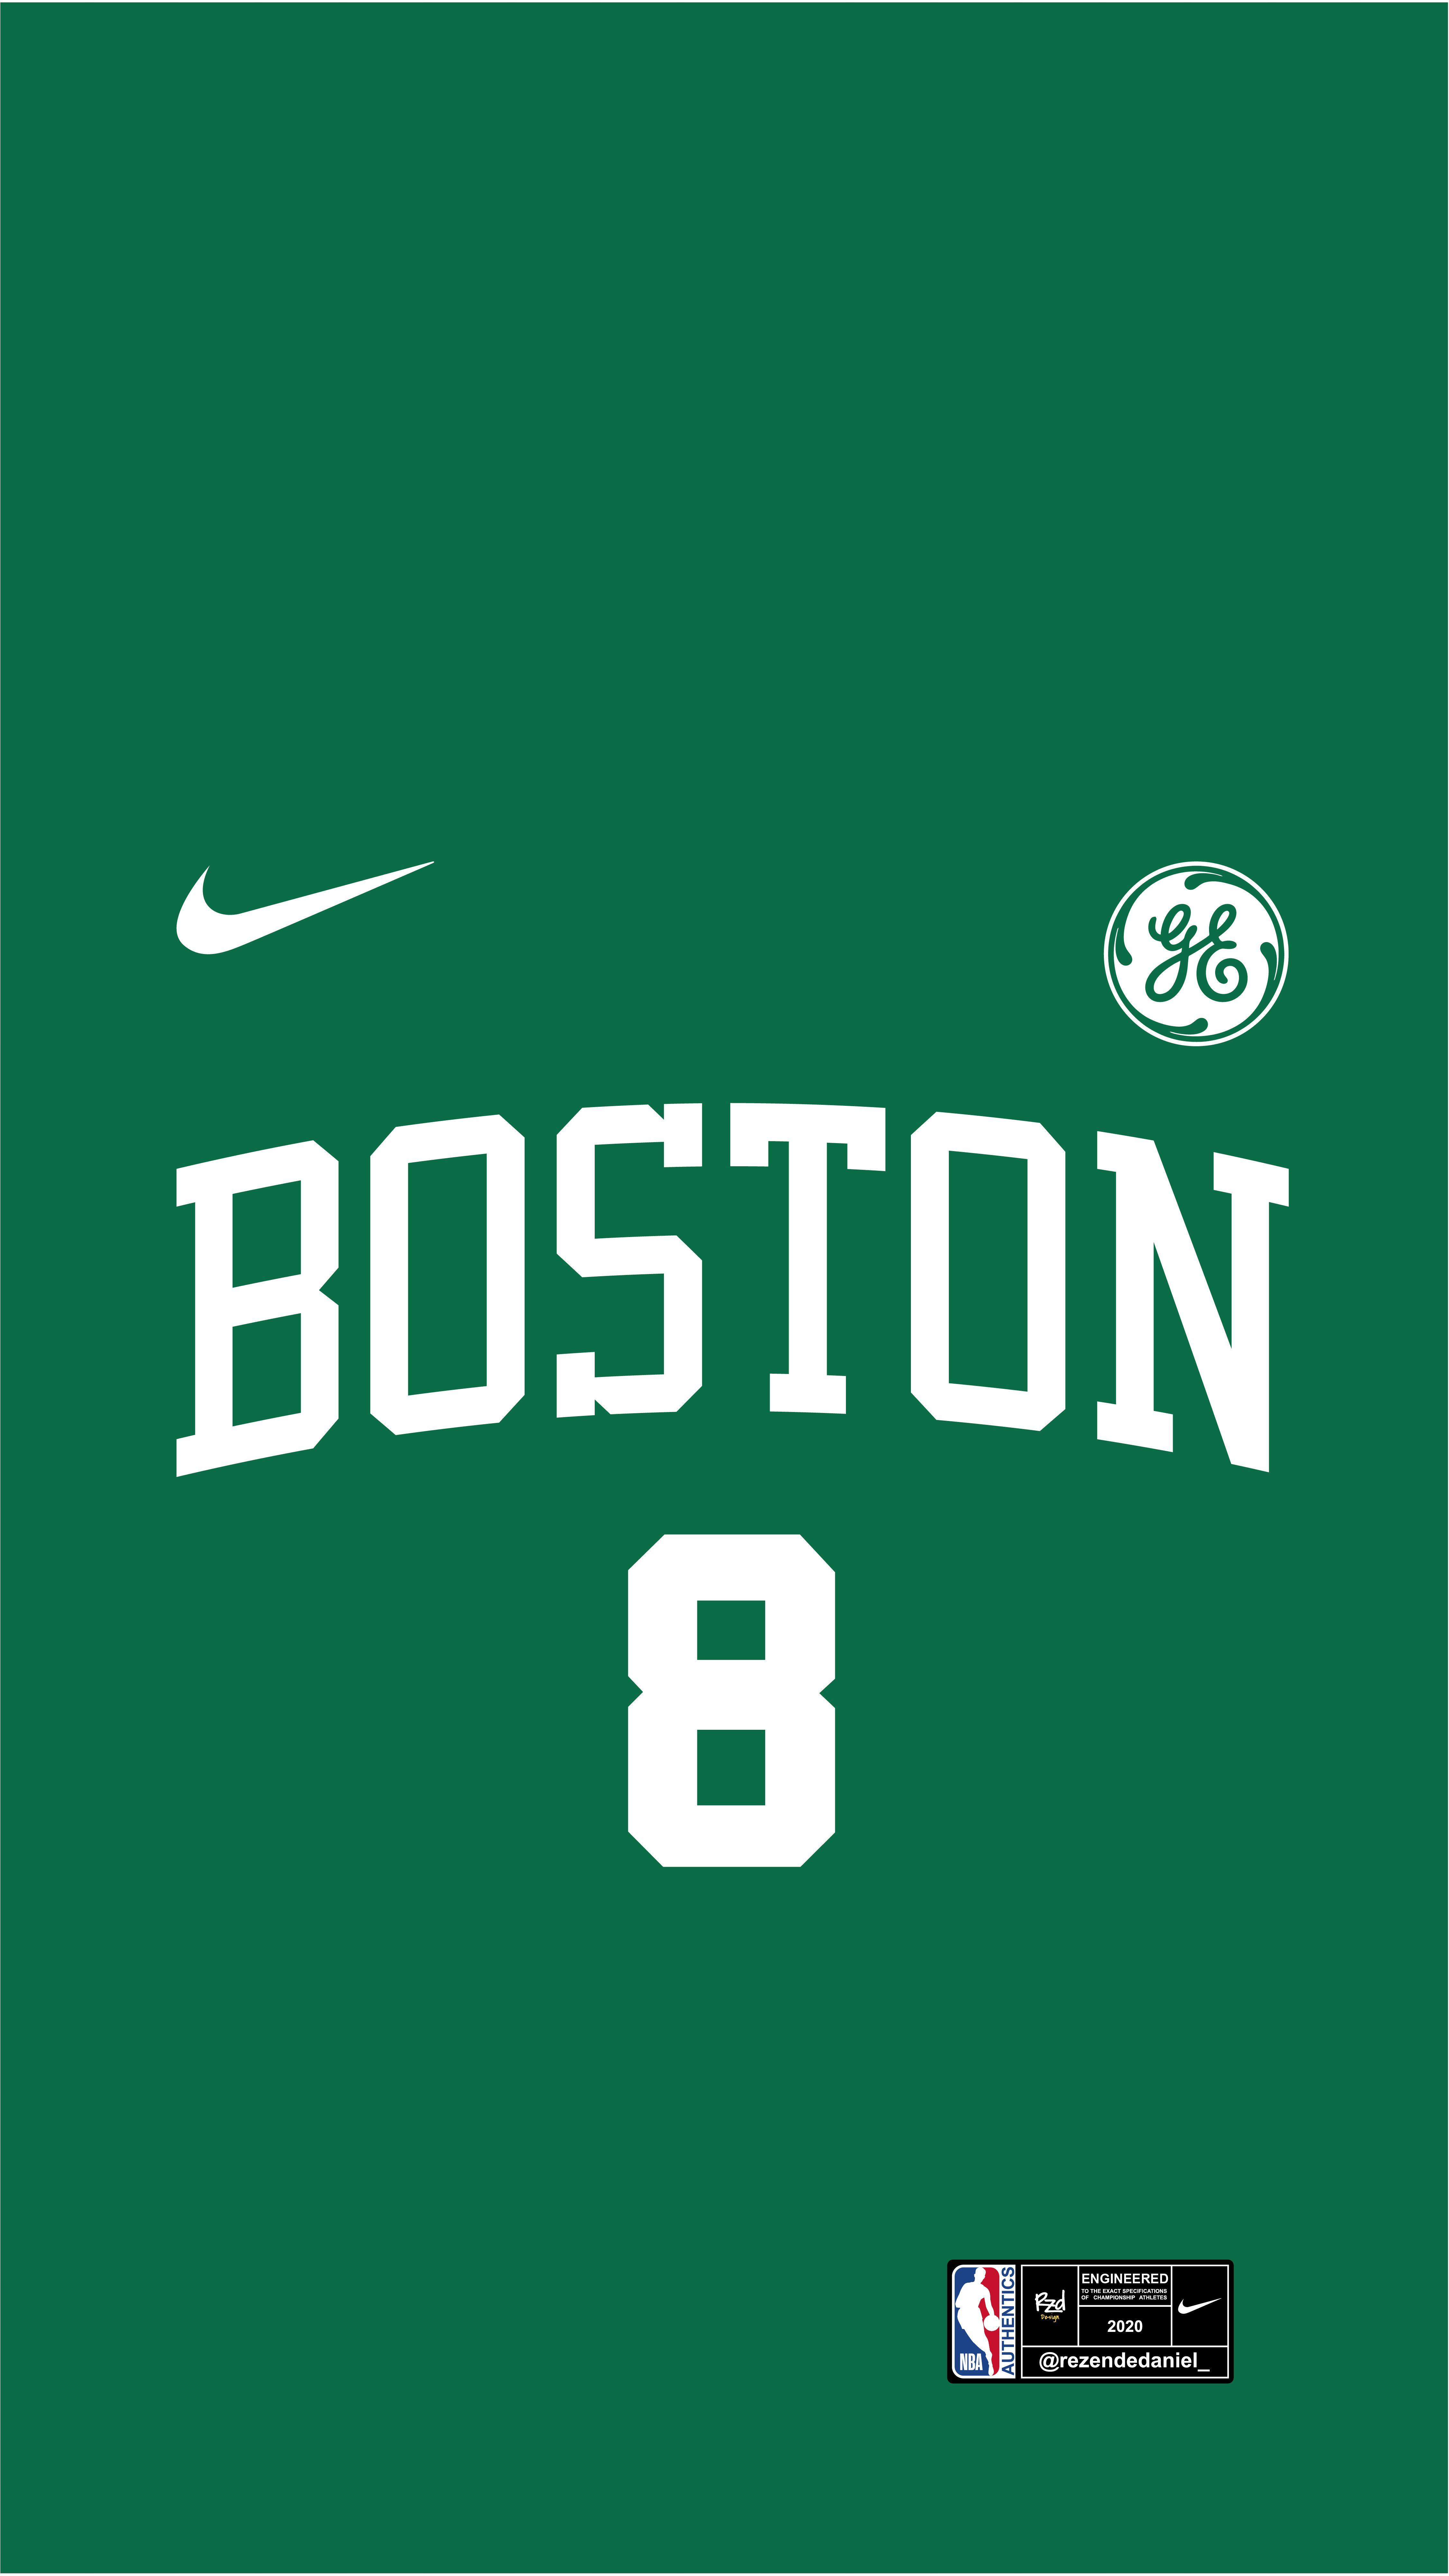 Wallpapers Nba 2019 20 Bos 02 Boston Celtics Wallpaper Boston Celtics Wallpapers Celtics Wallpaper